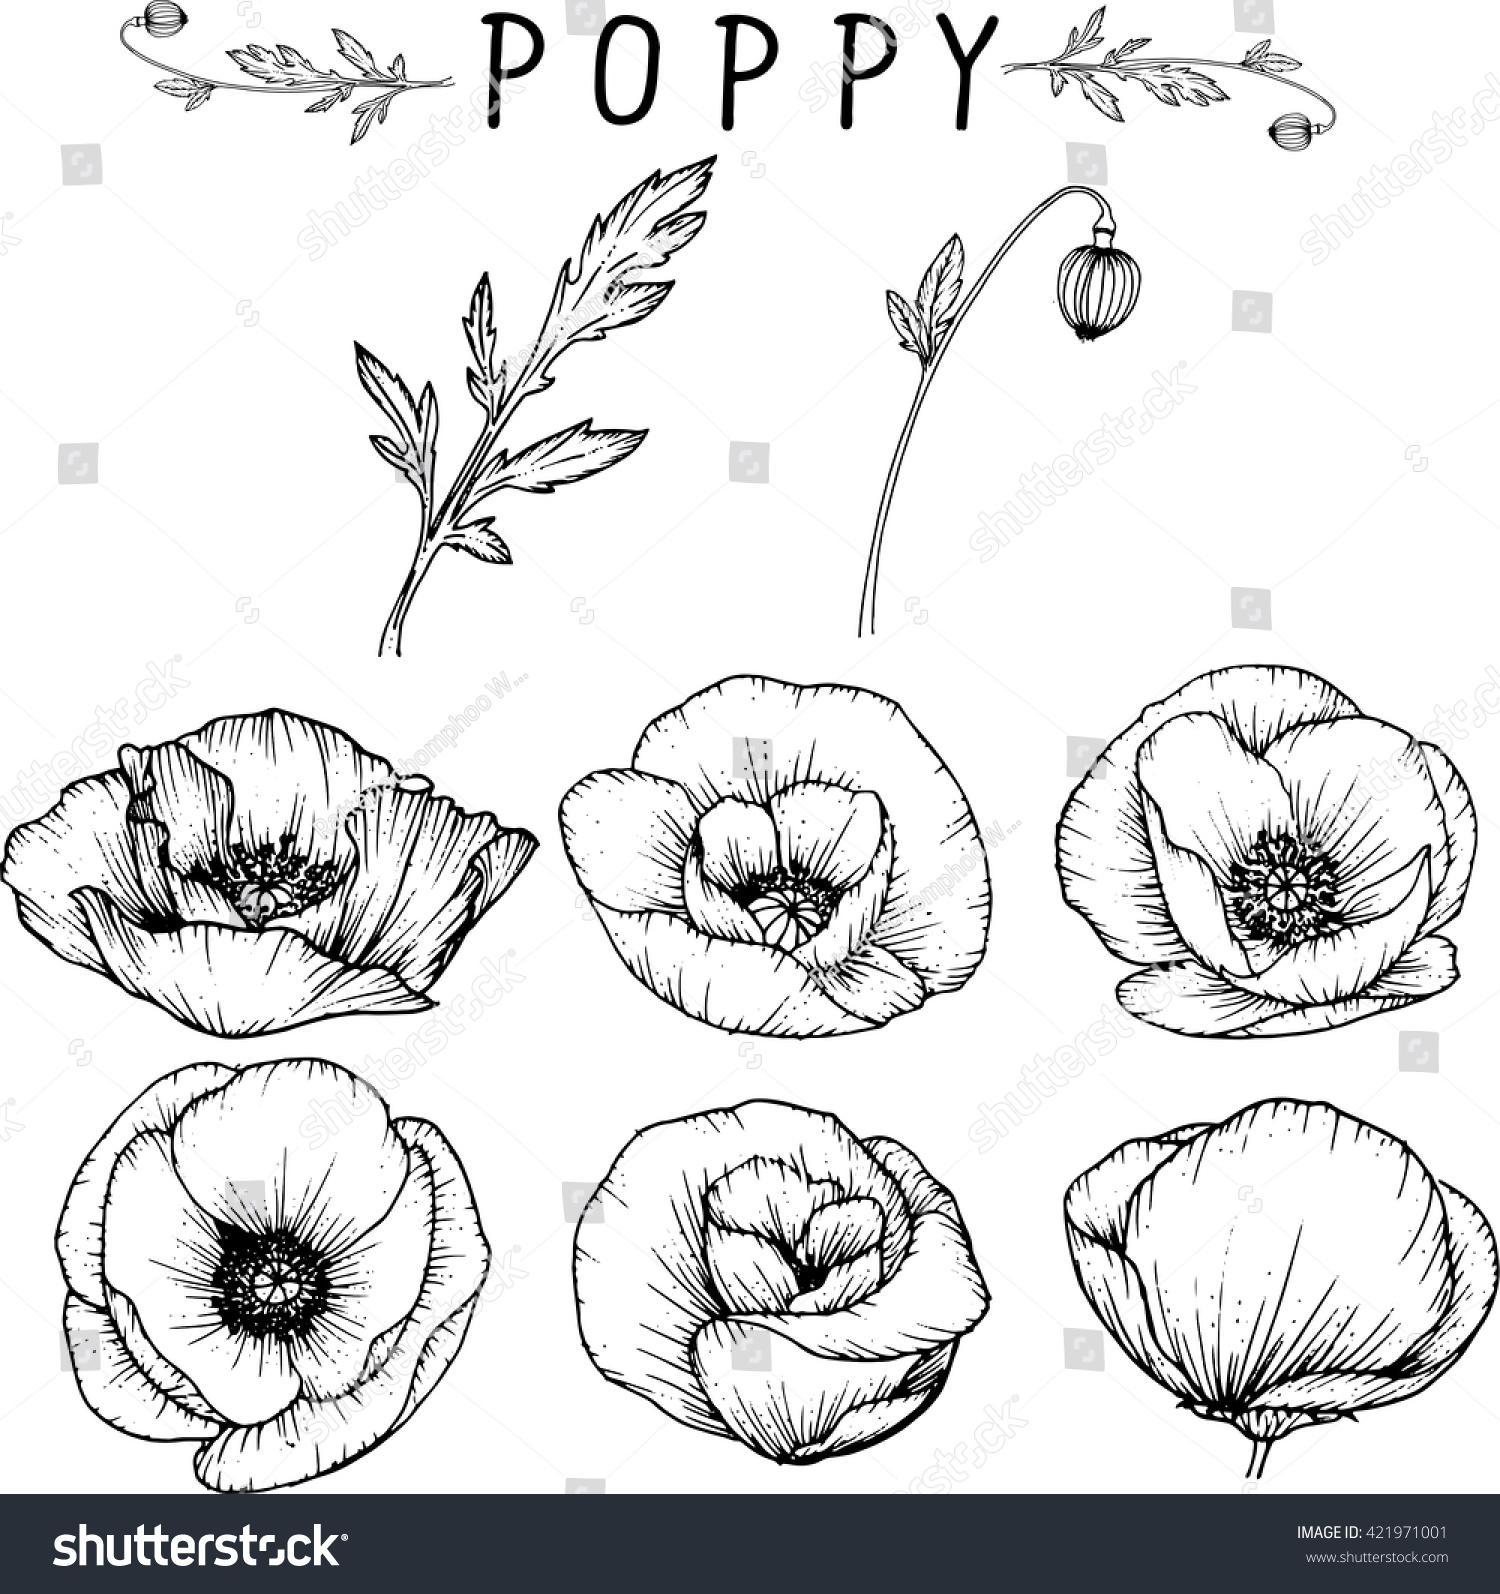 Poppy Flowers Drawings Vector Stock Vector 421971001 Shutterstock